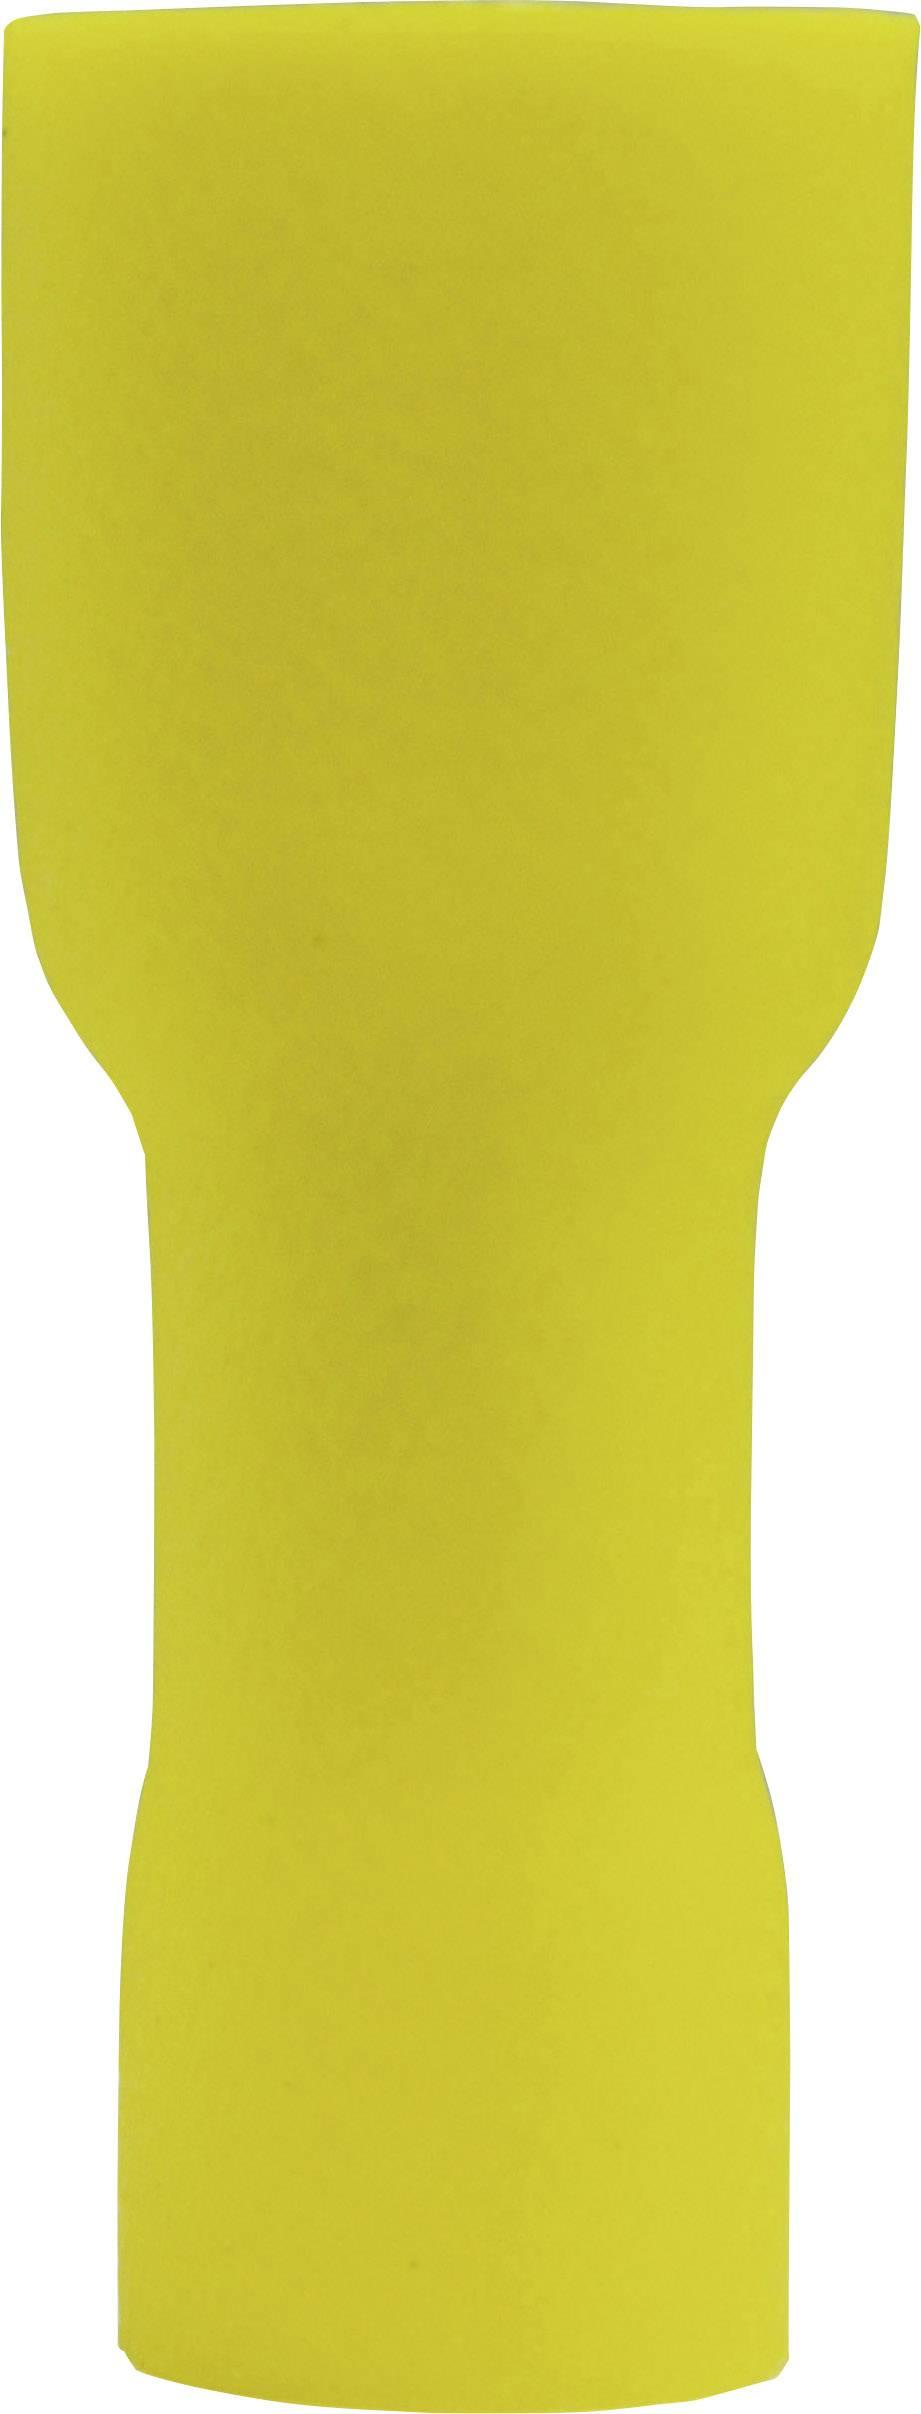 Faston zásuvka Vogt Verbindungstechnik 3947S 6.3 mm x 0.8 mm, 180 °, plná izolace, žlutá, 1 ks